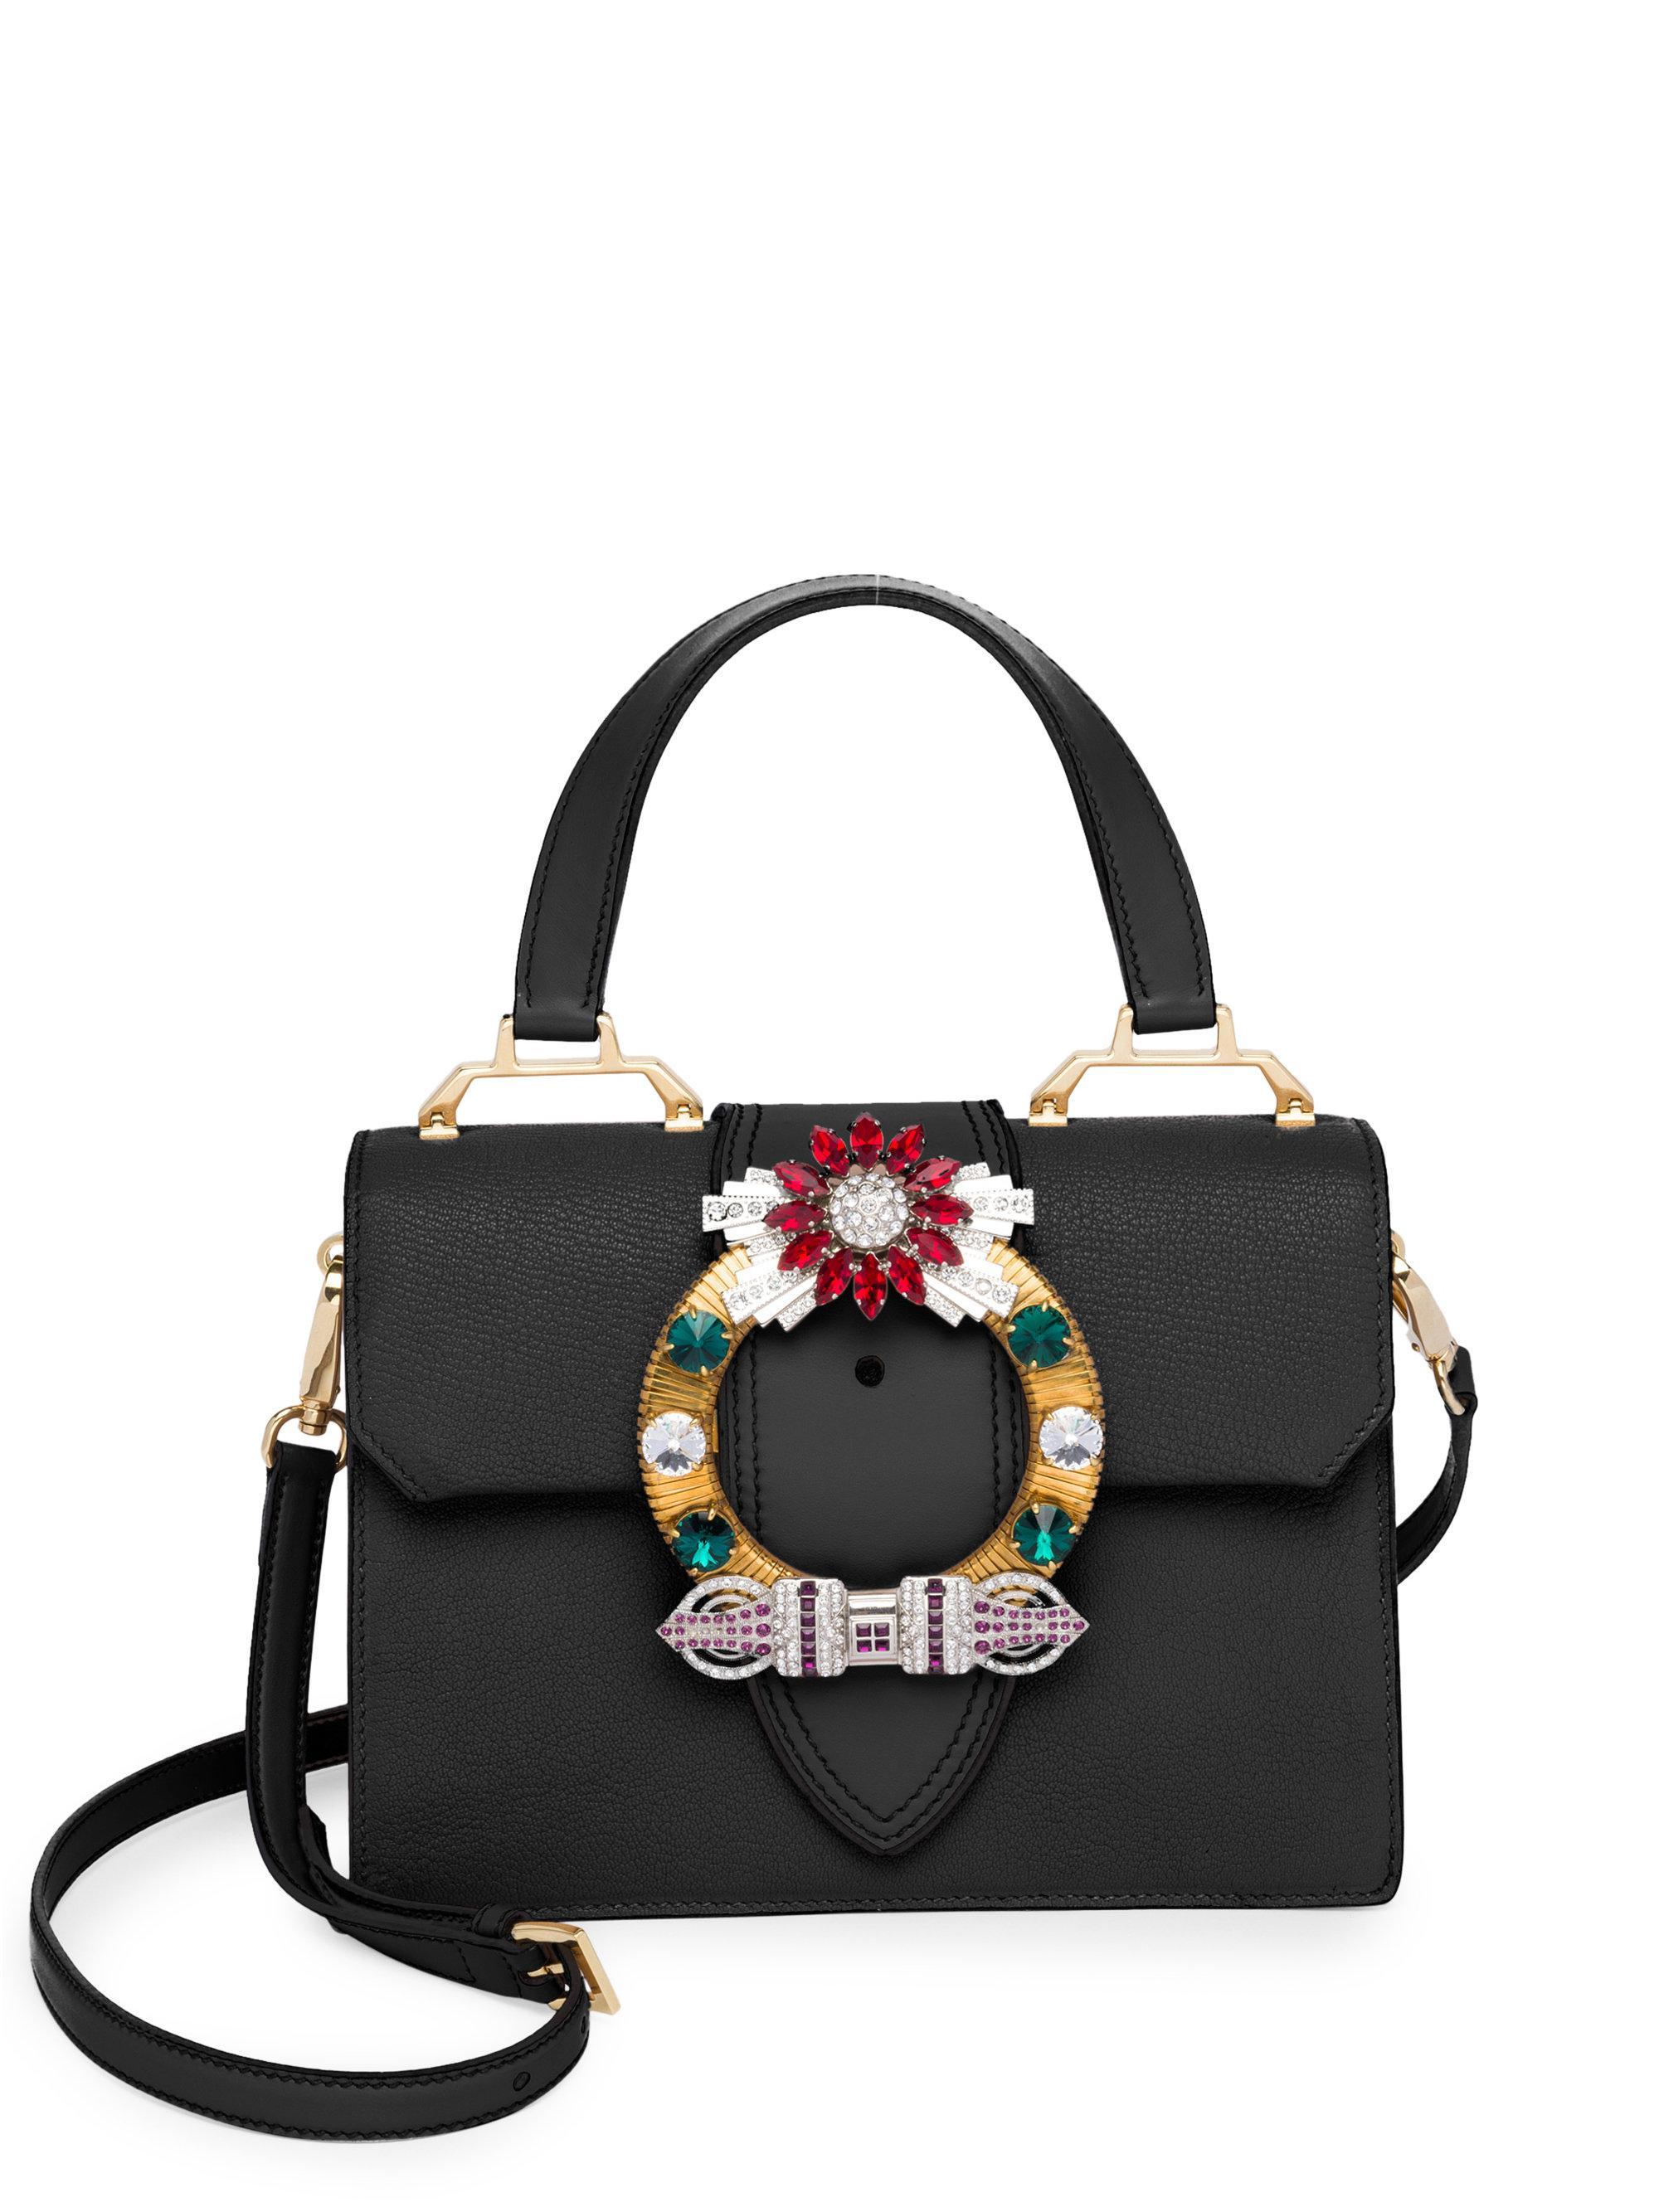 609e8378be5 Lyst - Miu Miu Crystal-embellished Leather Top Handle Bag in Black